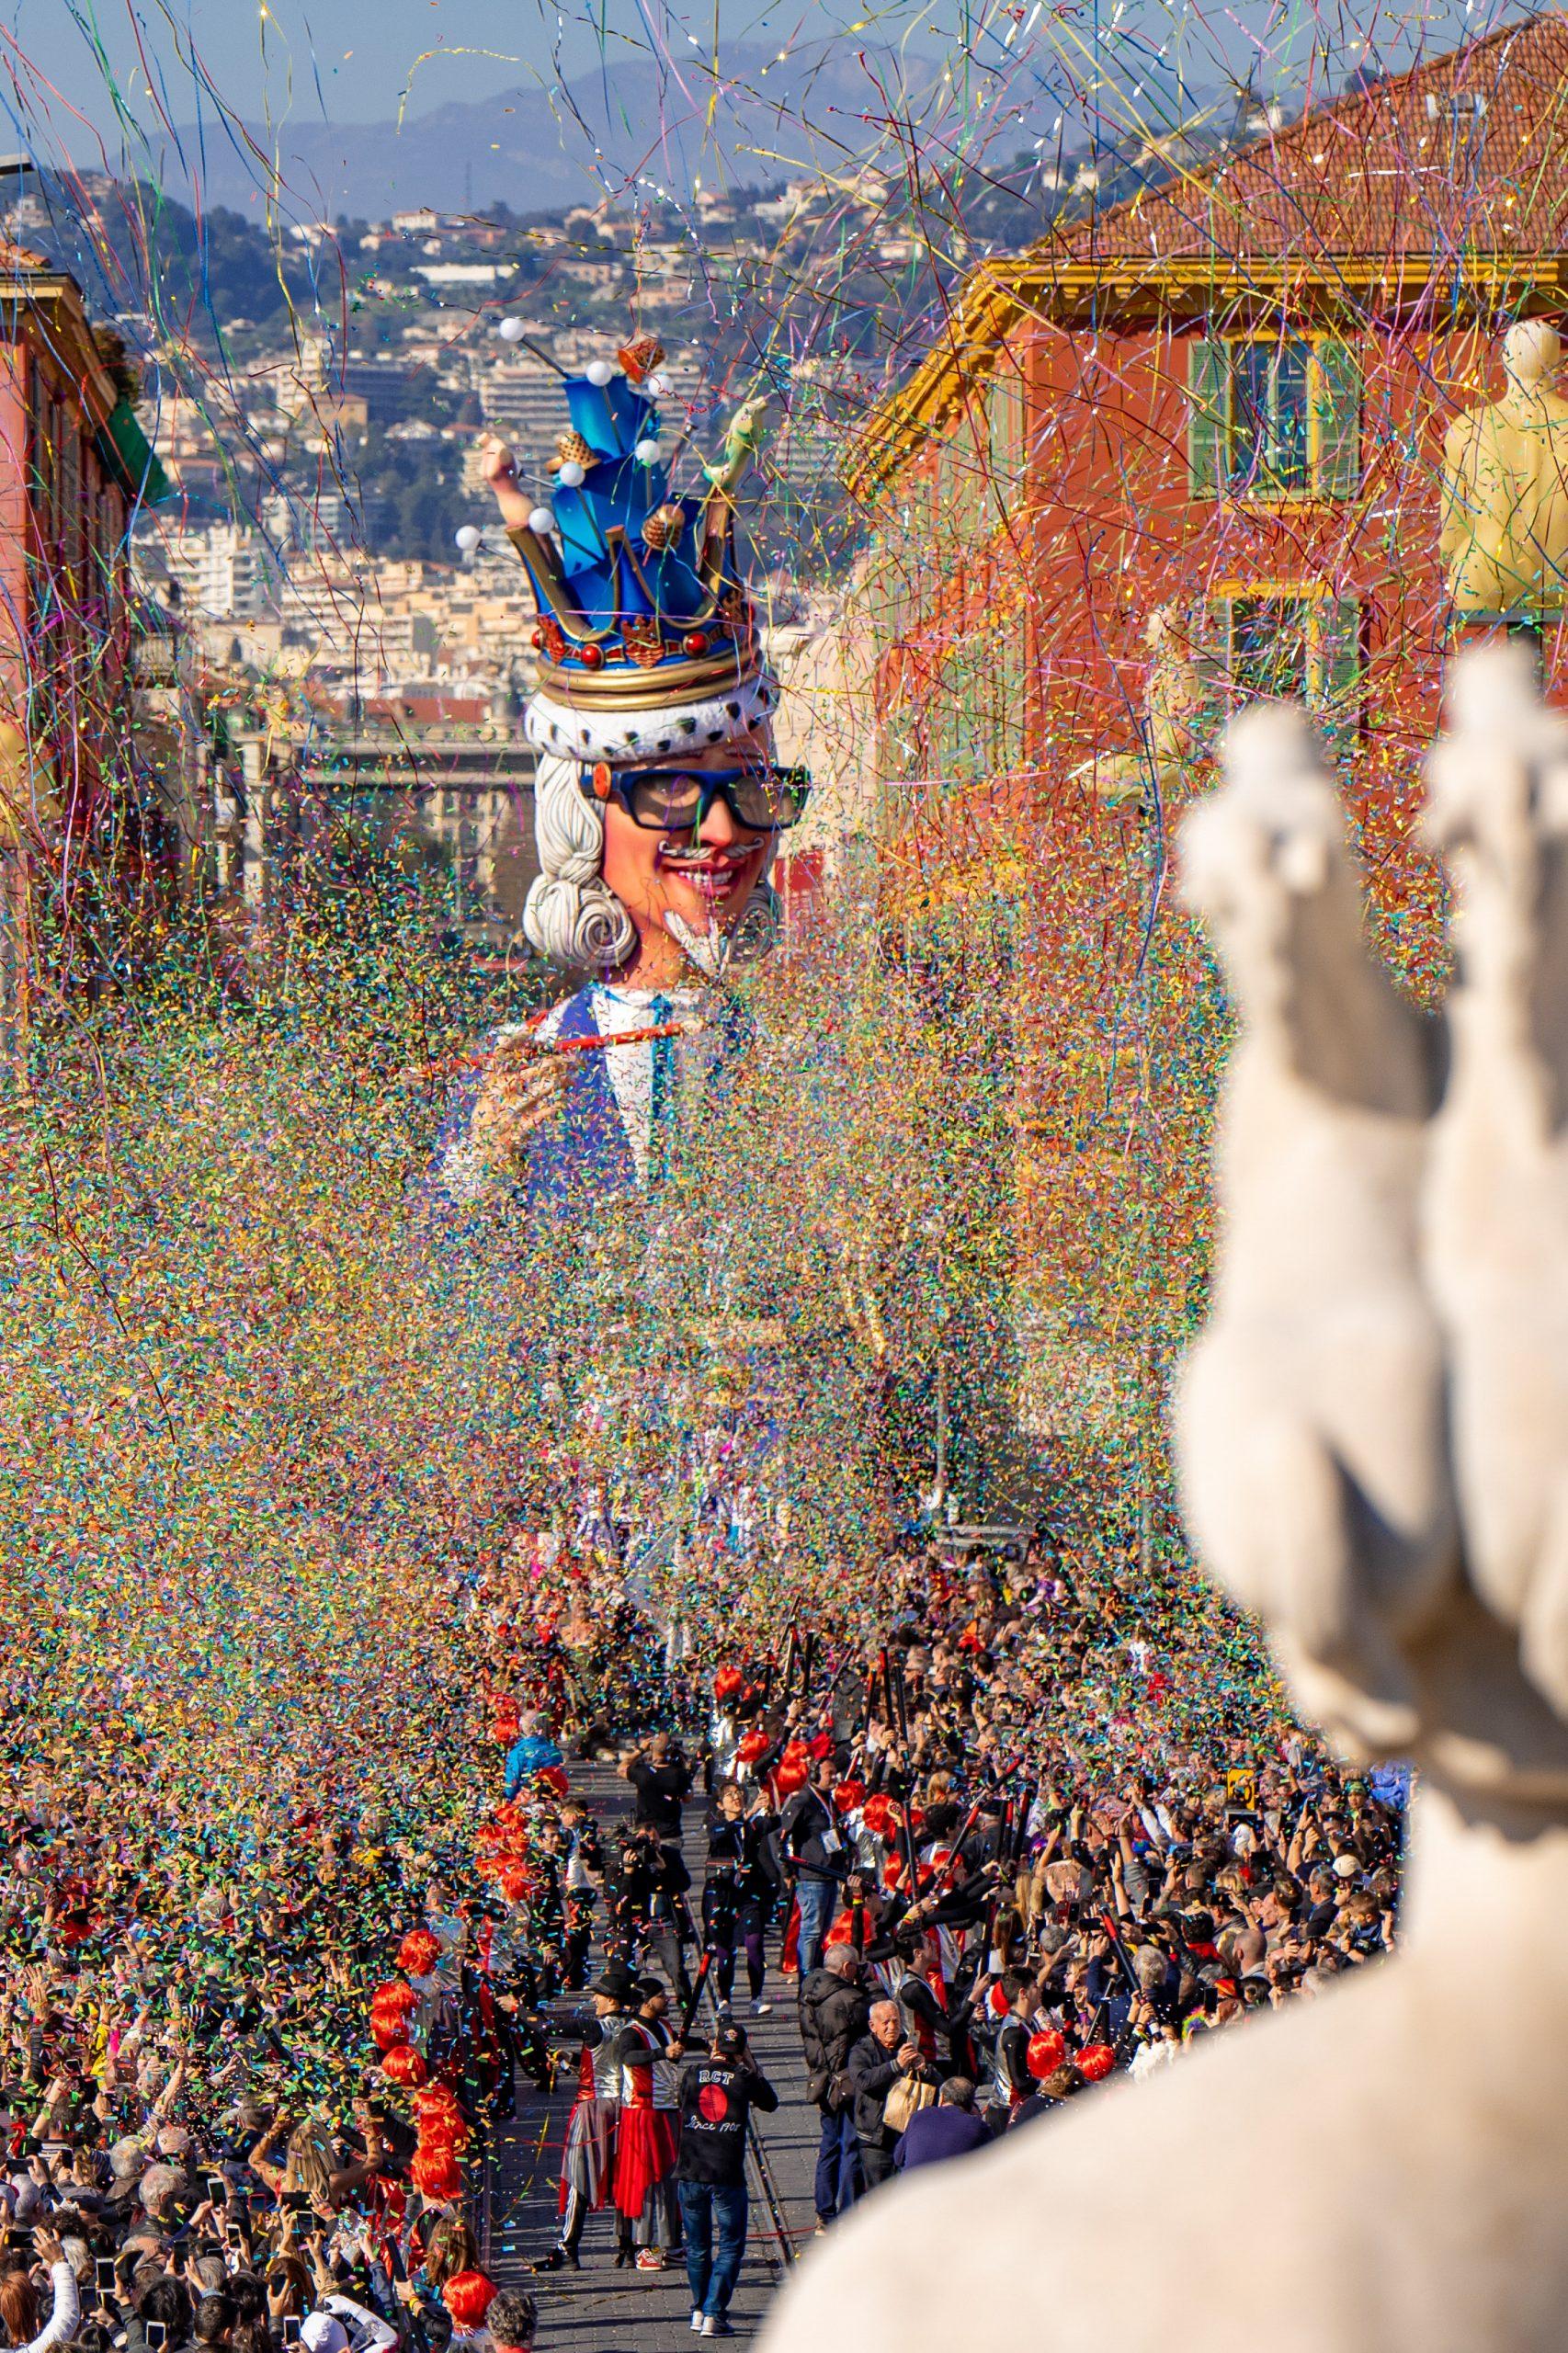 photographe nice bruno persico reportage carnaval bataille de fleur 9